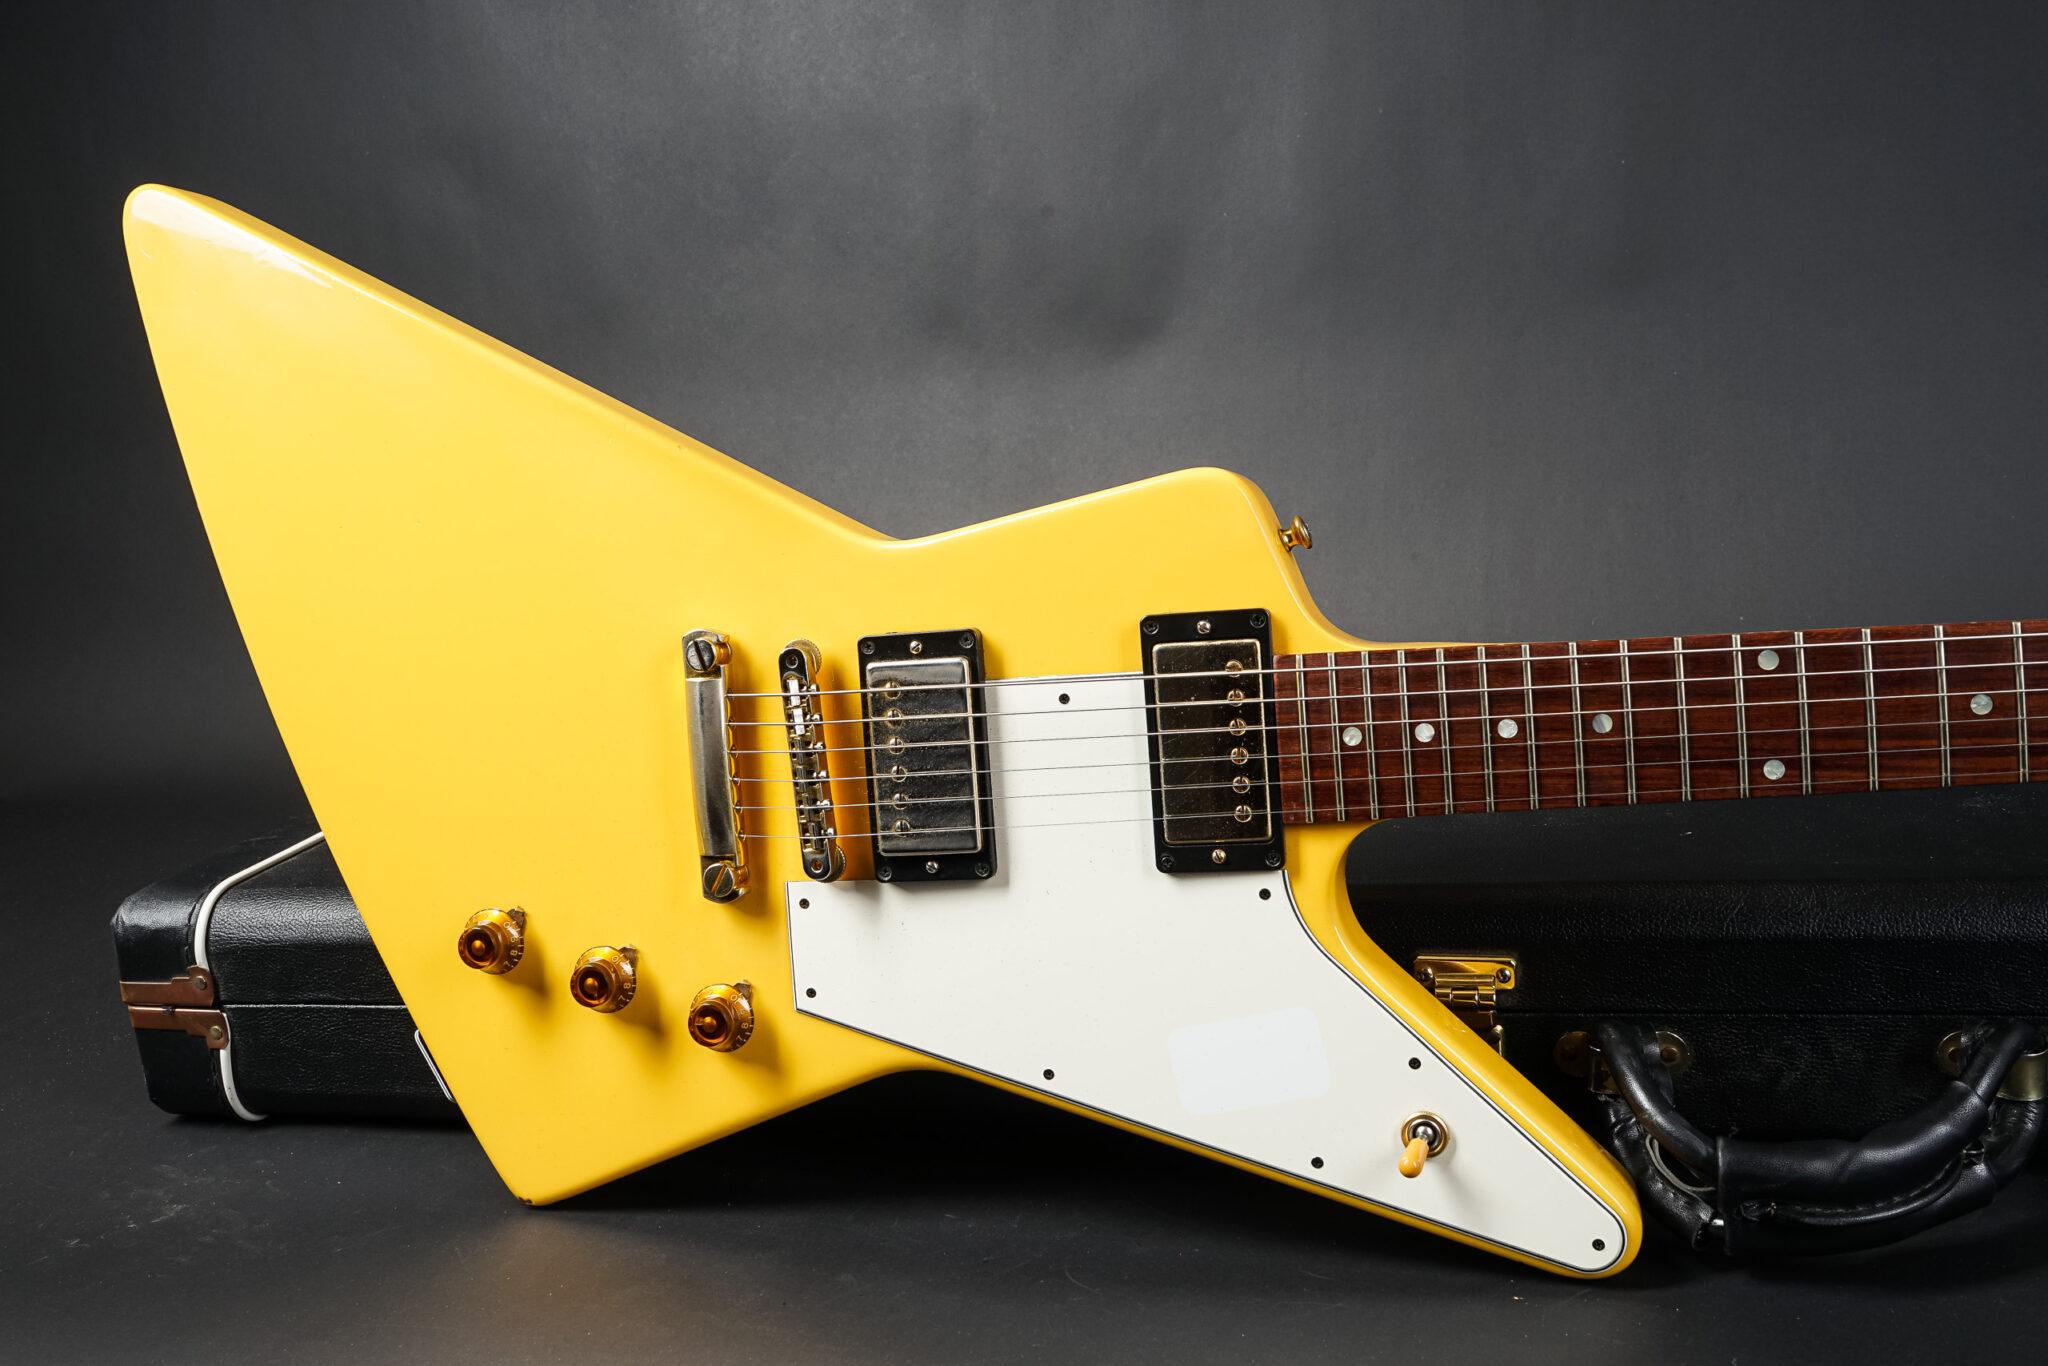 https://guitarpoint.de/app/uploads/products/2013-gibson-custom-shop-1958-explorer-aspen-white-vos/2013-Gibson-Explorer-Custom-Shop-1958-Reissue-Aspen-White-7-2048x1366.jpg